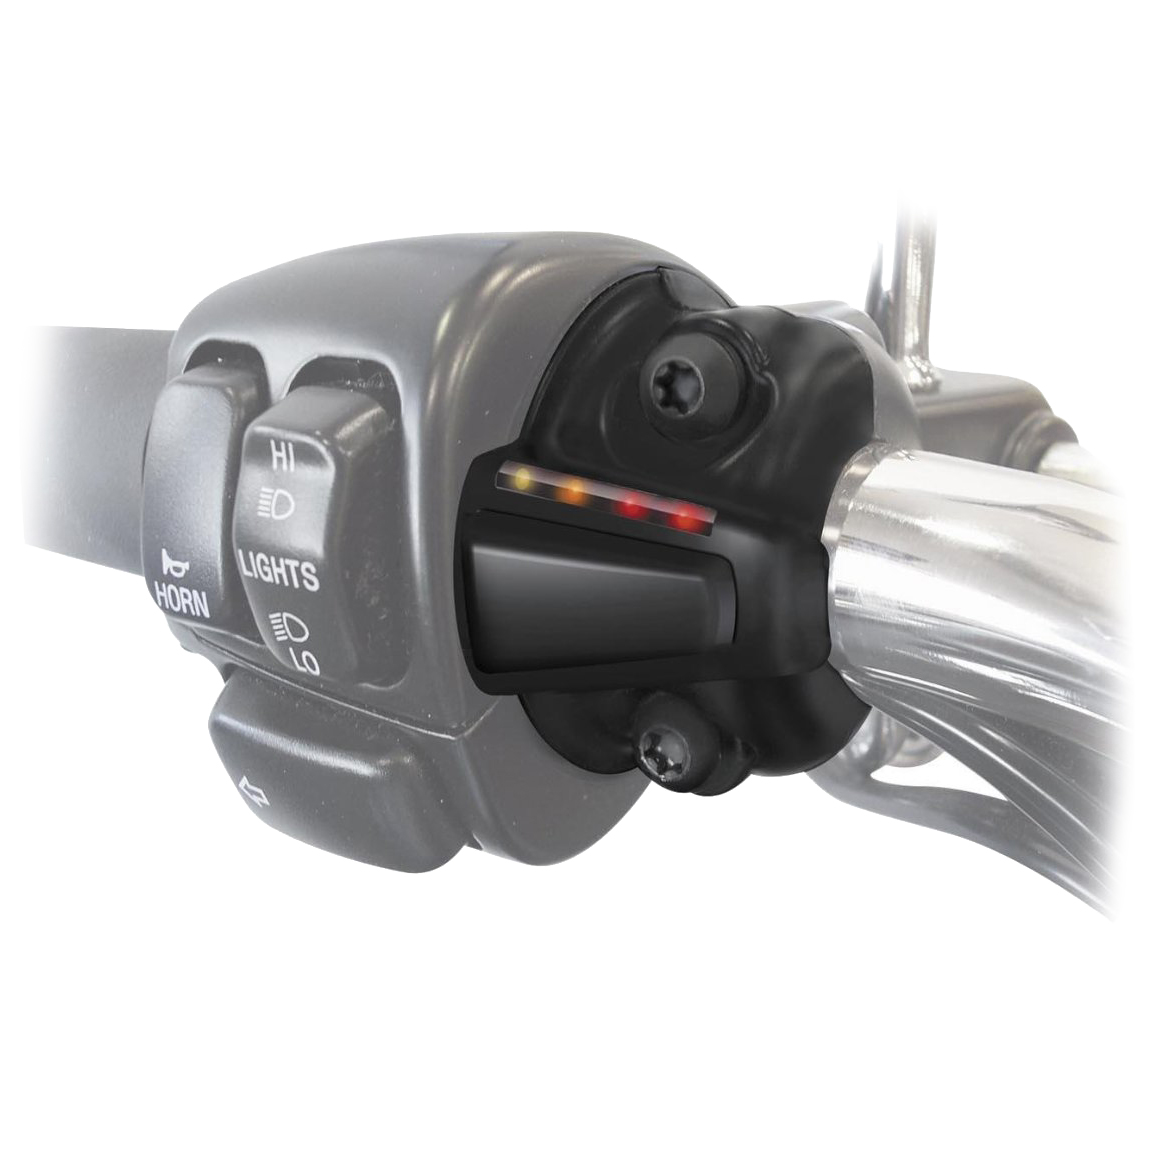 Symtec Grip Warmer Kit, LH Black Controller, Clutch S